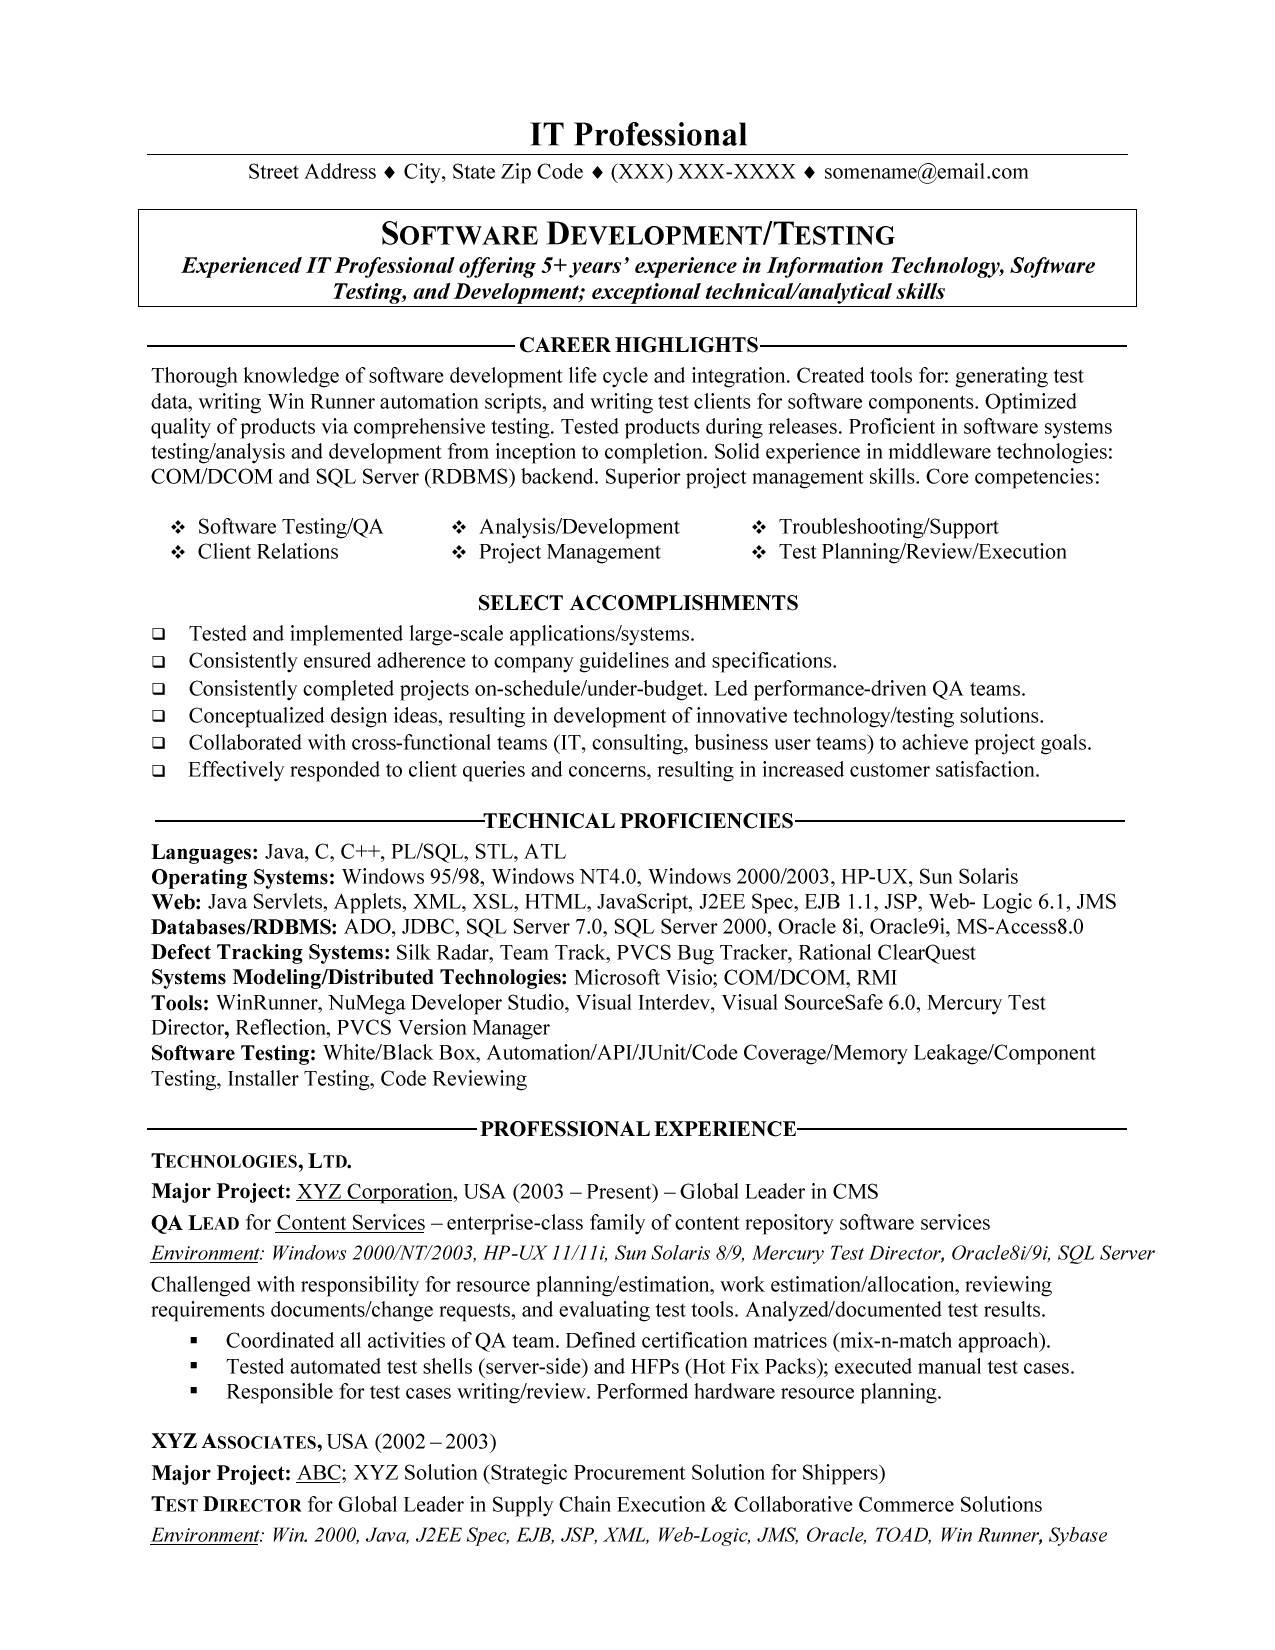 Professional Resume Builder Ottawa Home Gseauedu Certified Professional Resume Writers In Ontario